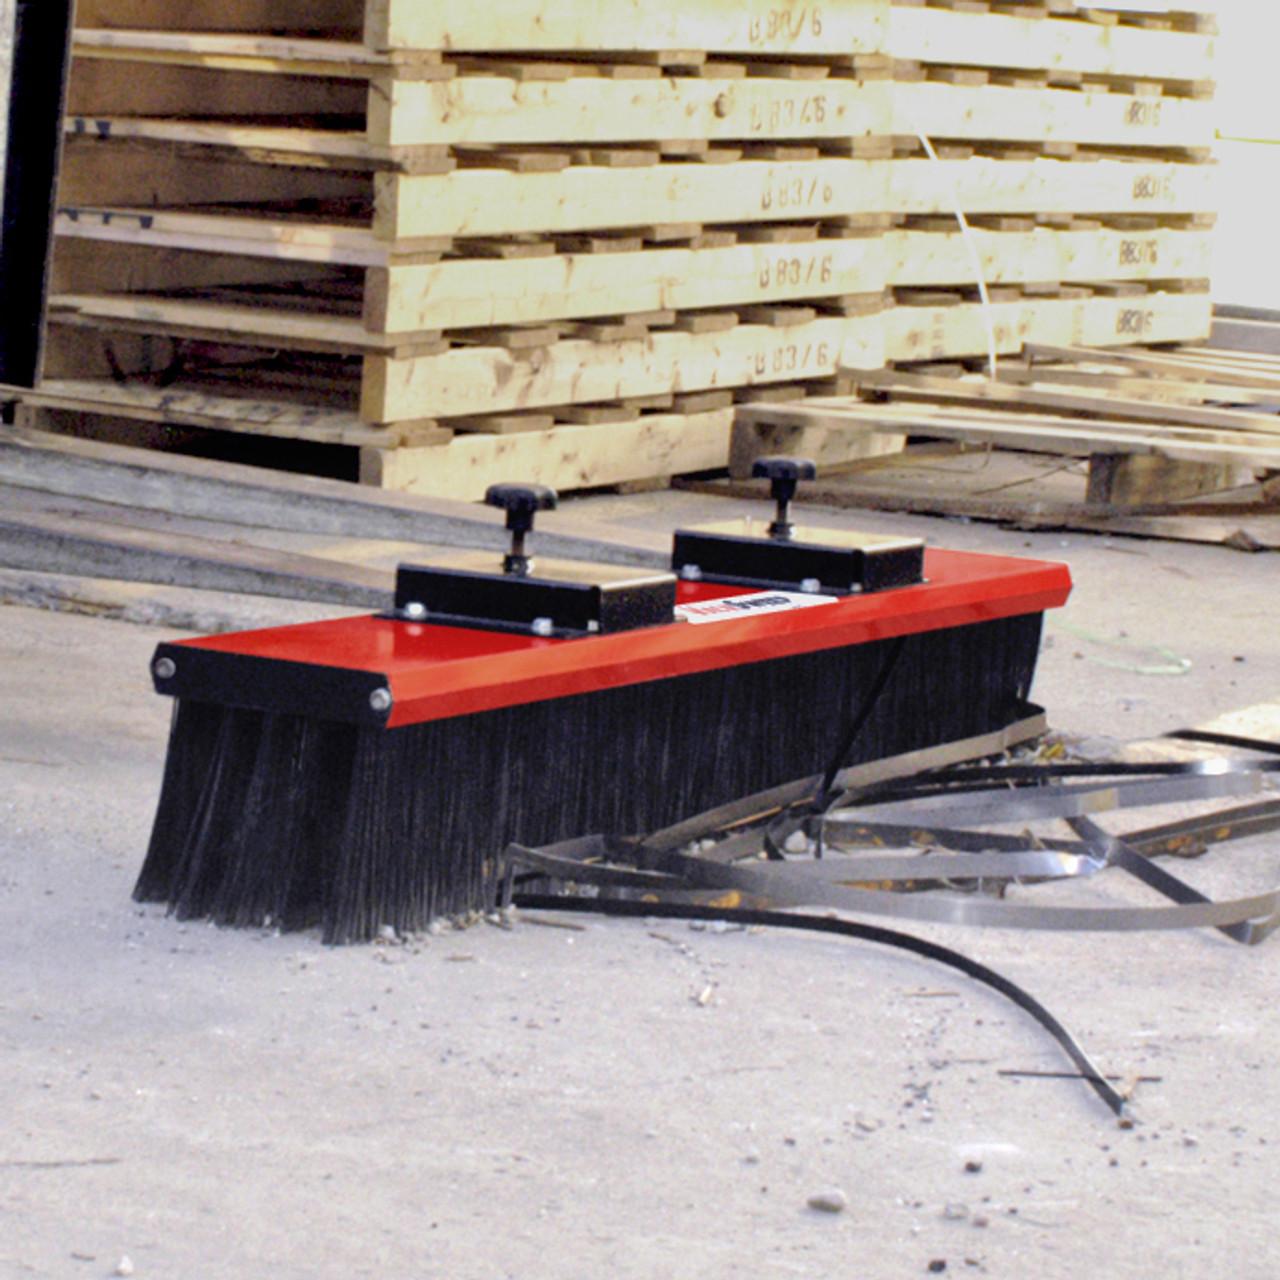 Forklift Mounted Broom - Value Series